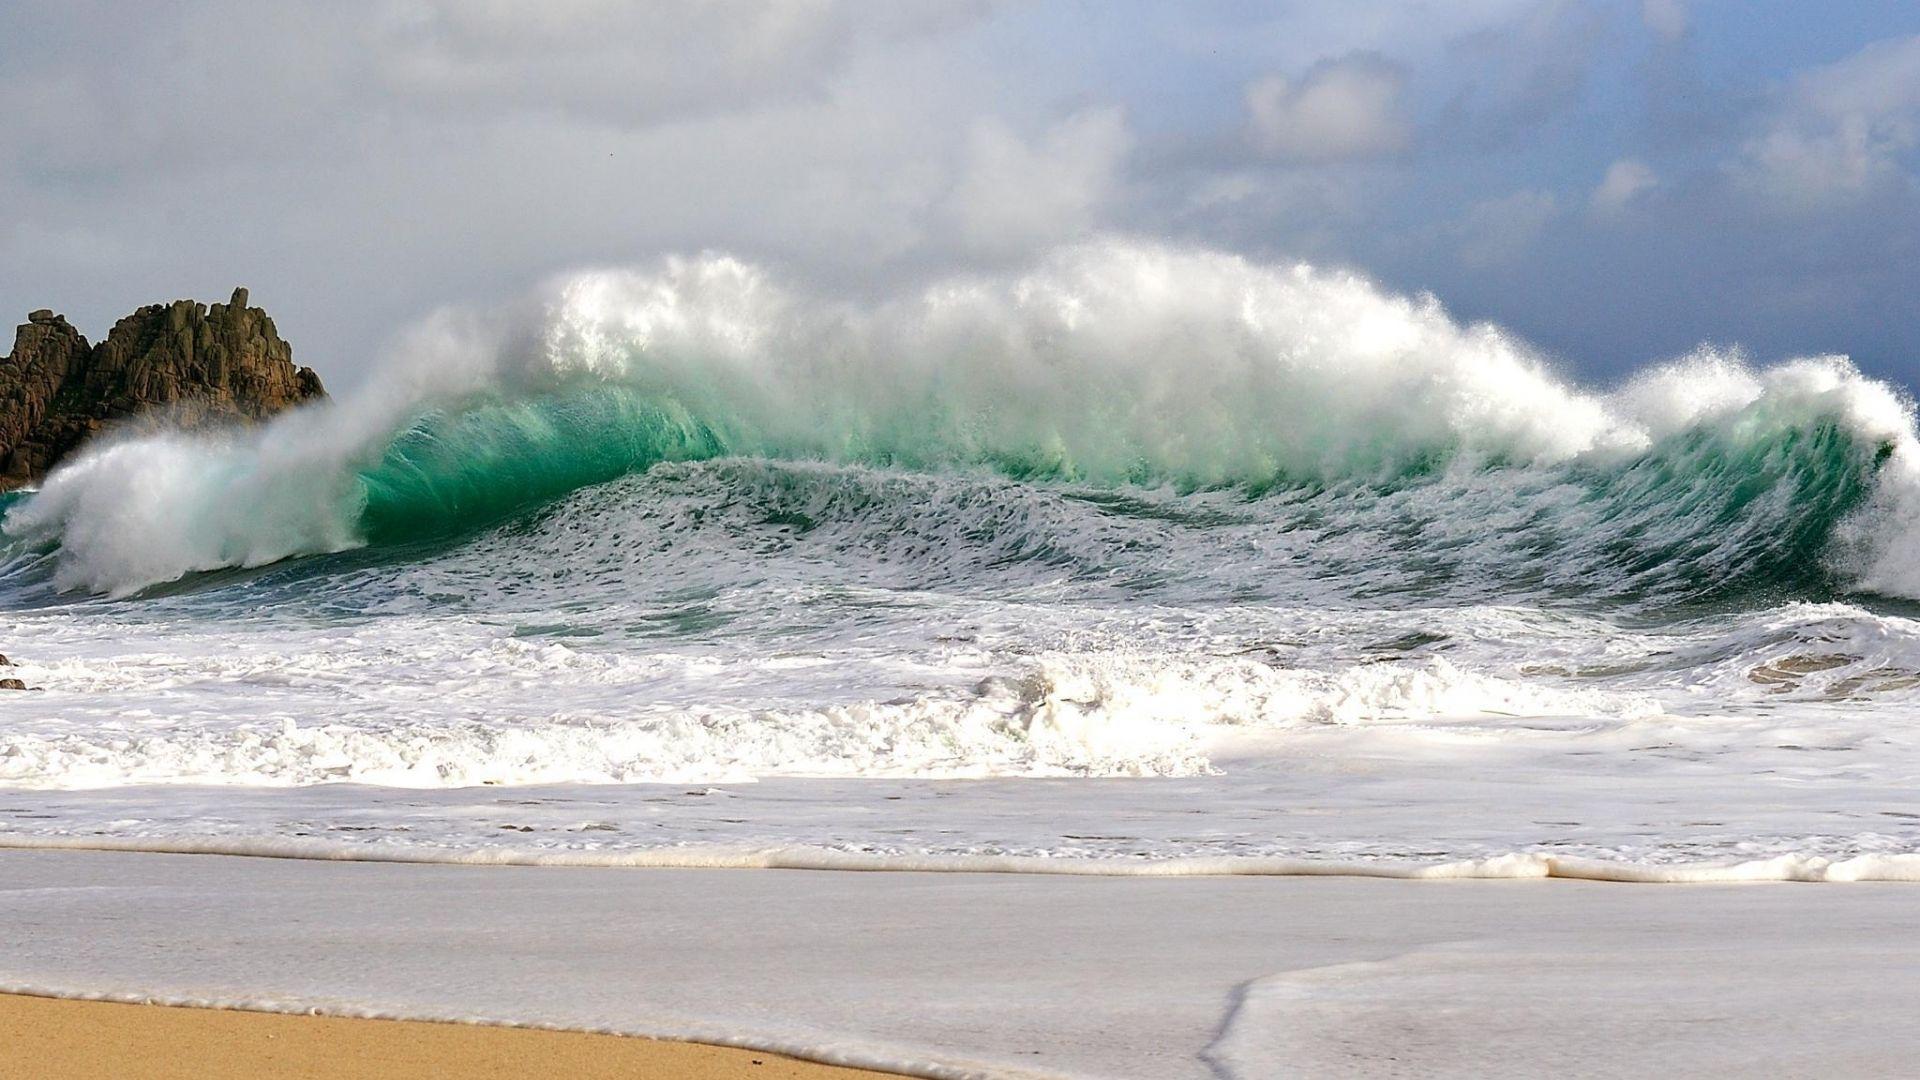 Ocean Beach Wallpaper 1920x1080 Awesome Ocean Wave Crashing On Beach Hd Wallpaper Waves Wallpaper Beach Wallpaper Waves